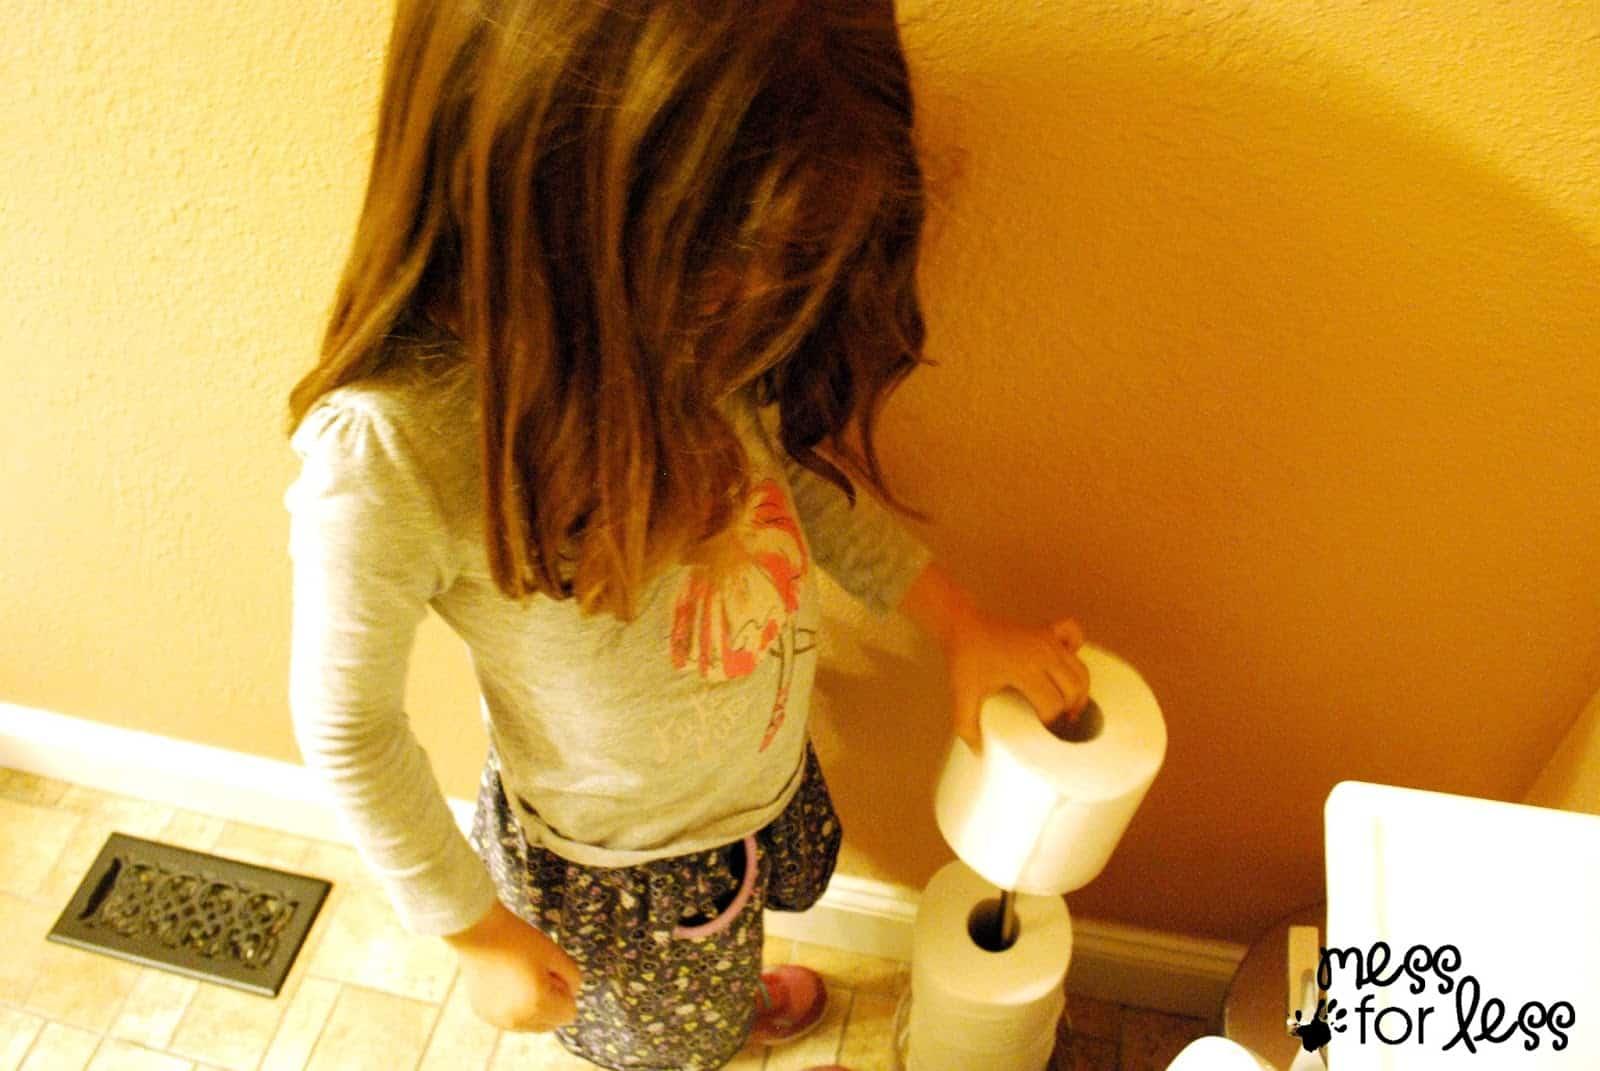 Clean care toilet paper #CtnlCareRoutine #PMedia #sponsored